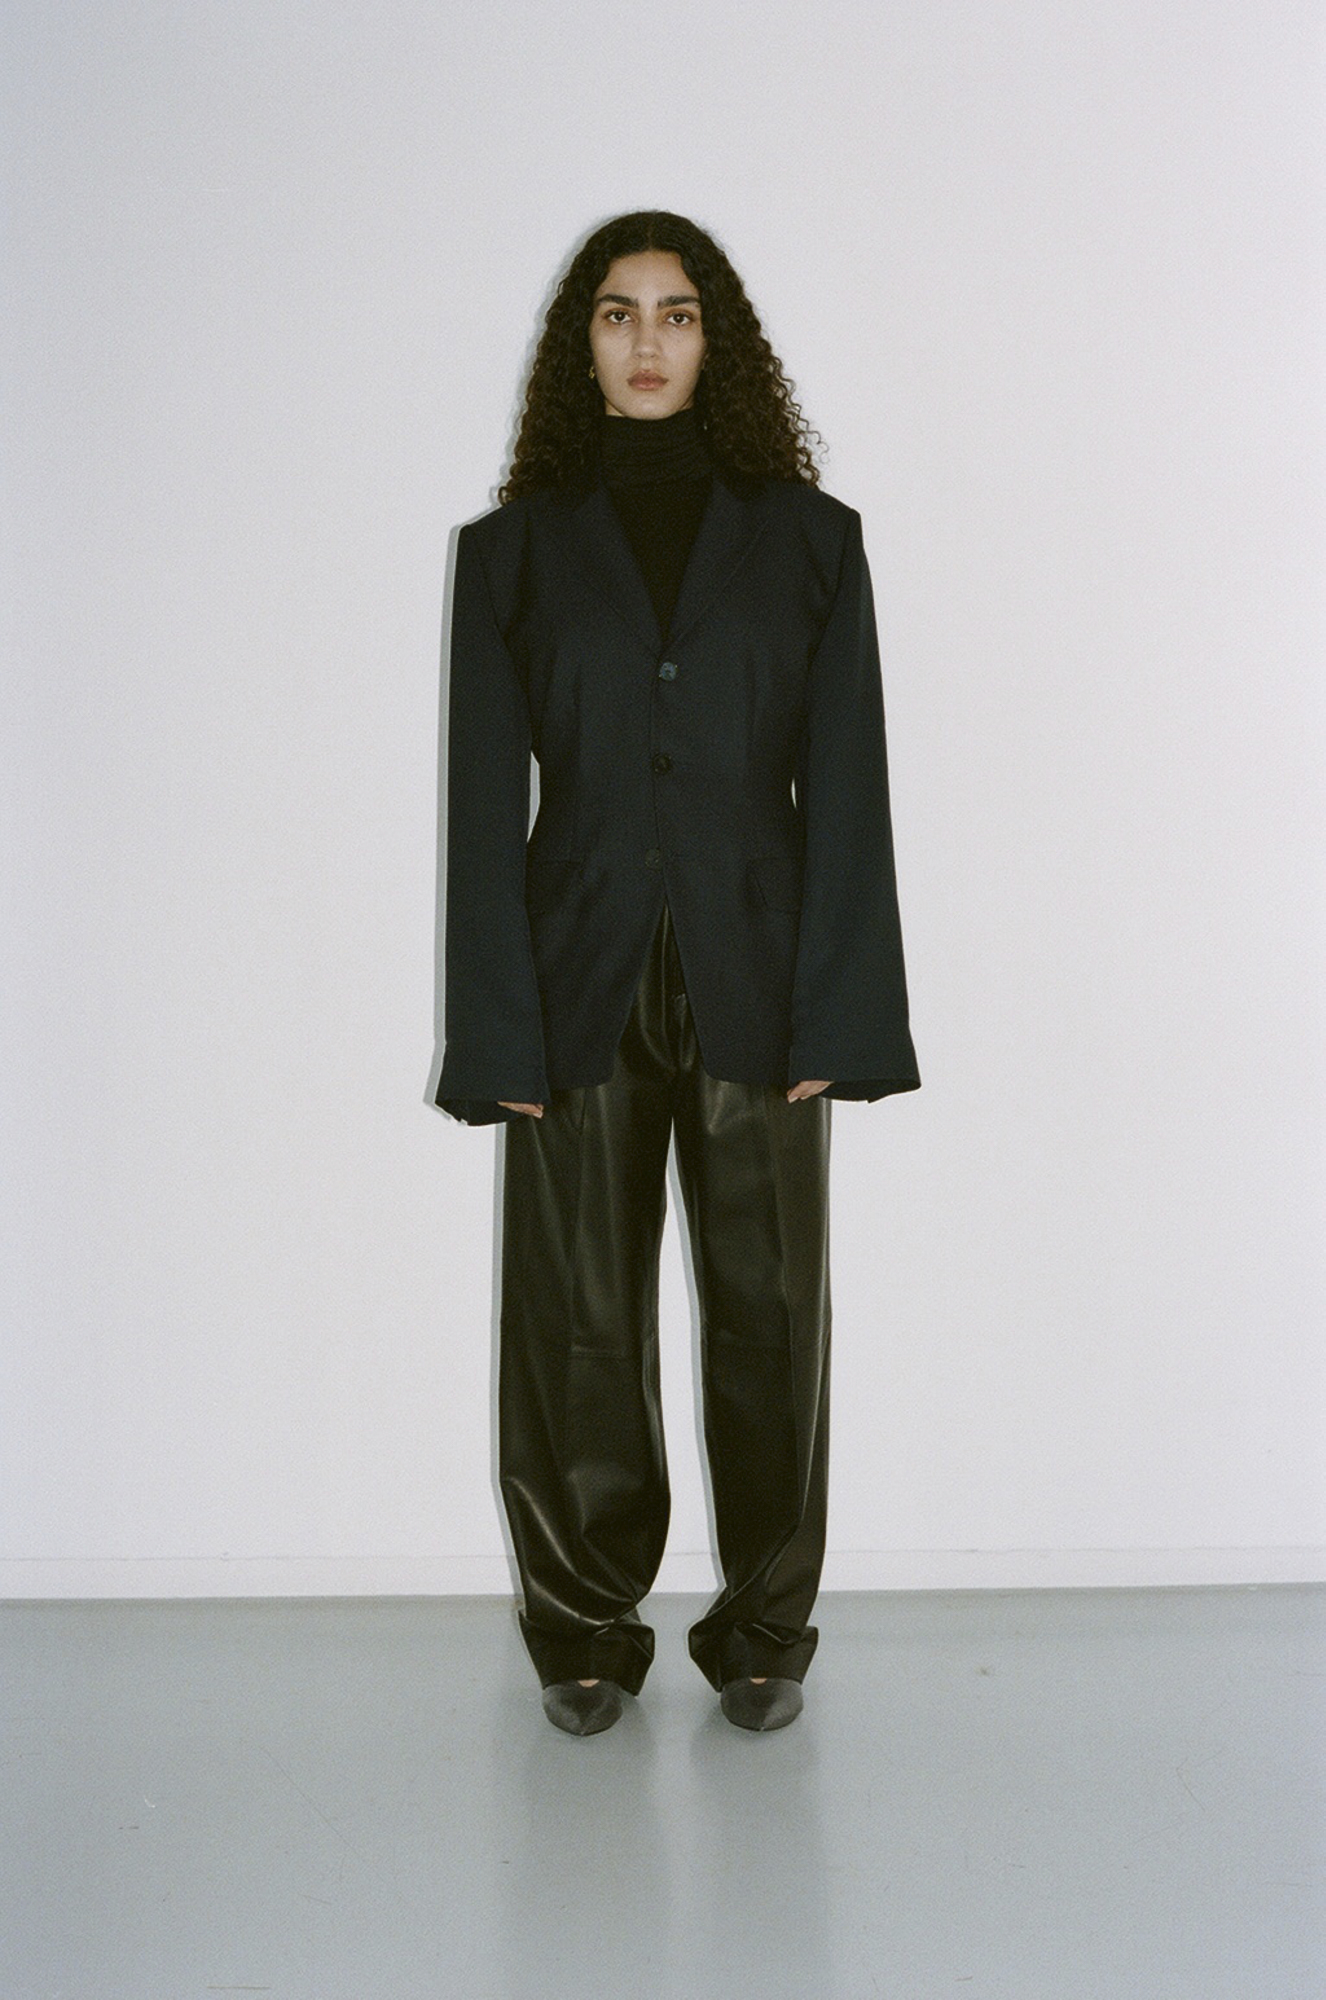 GAUCHERE Fall Winter 2021 Paris Fashion Week LOOK 2 Jacket TALLY, Body TILO, Trousers TANHA, Shoes PILLOW PUMP